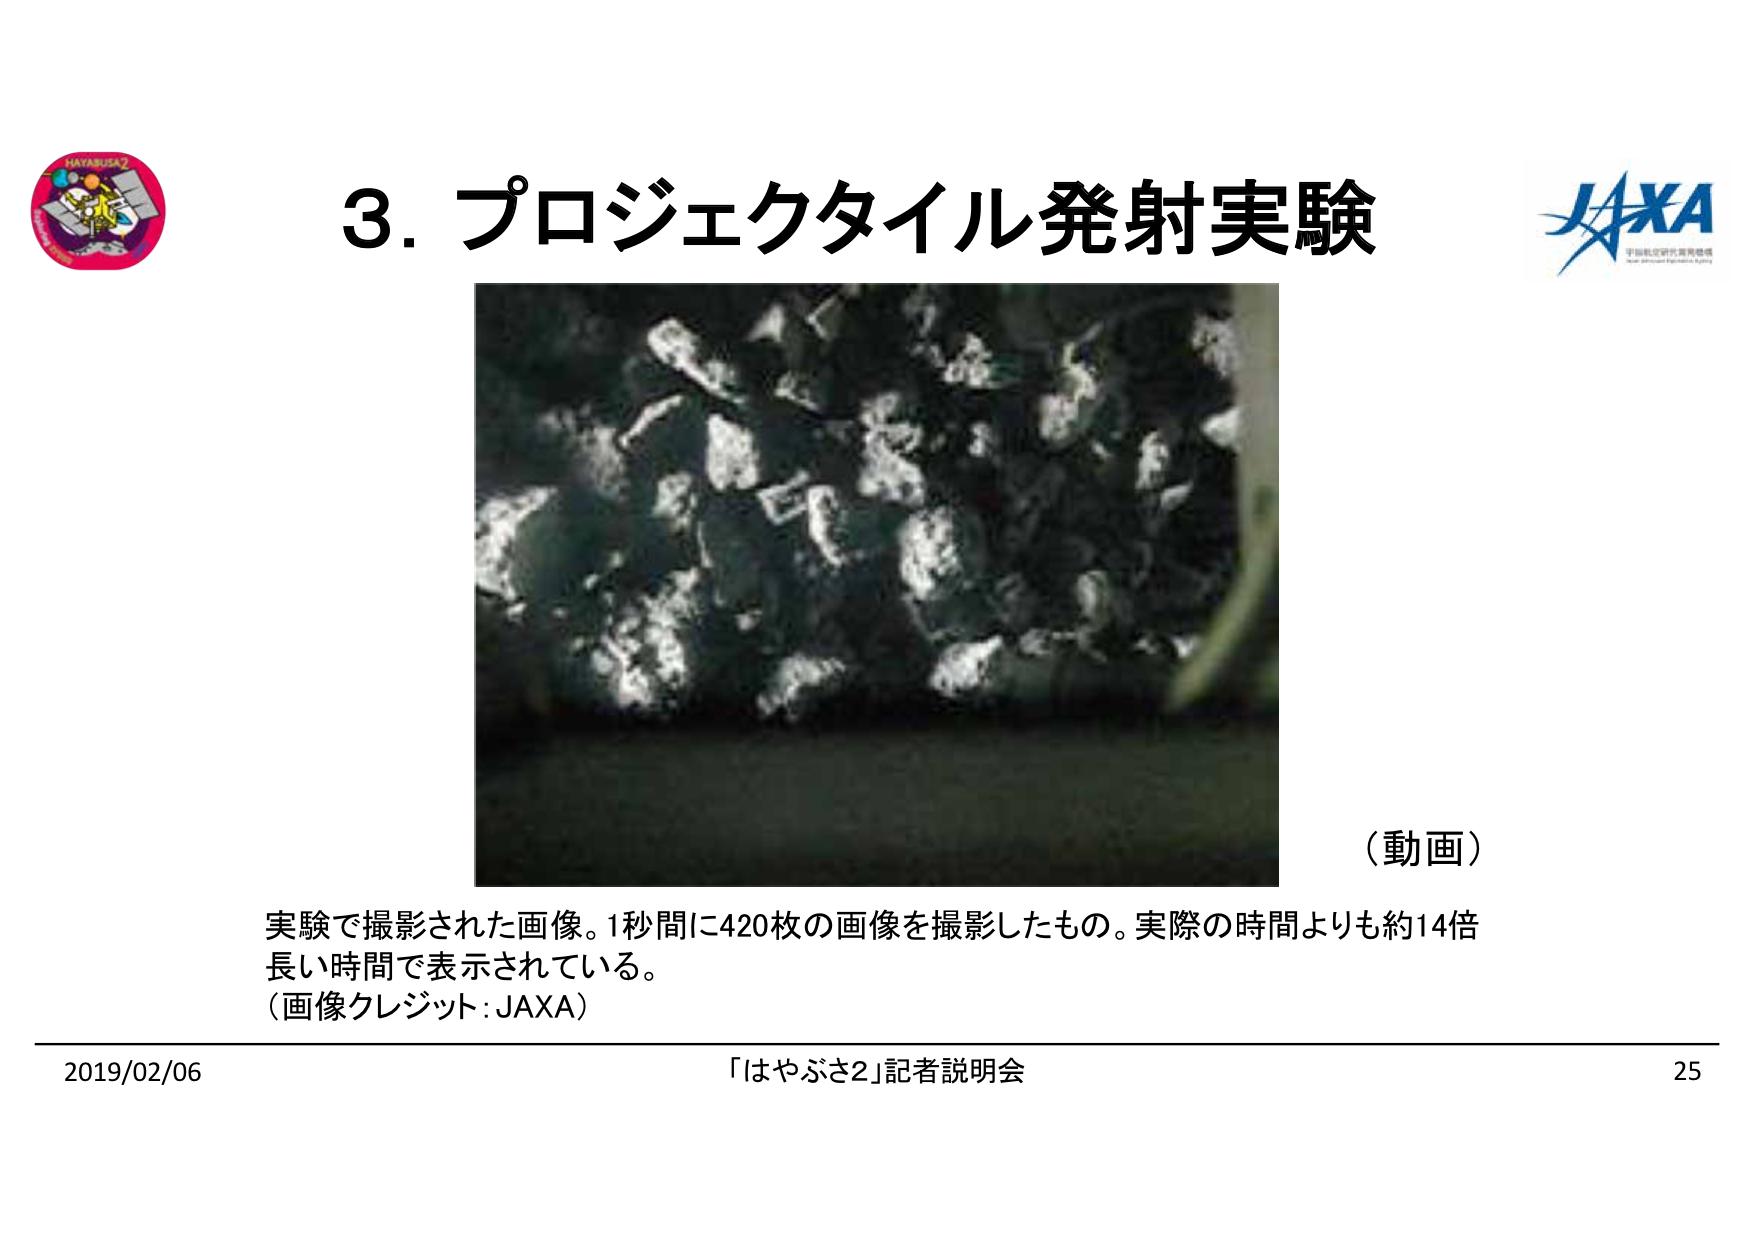 f:id:Imamura:20190204175519p:plain